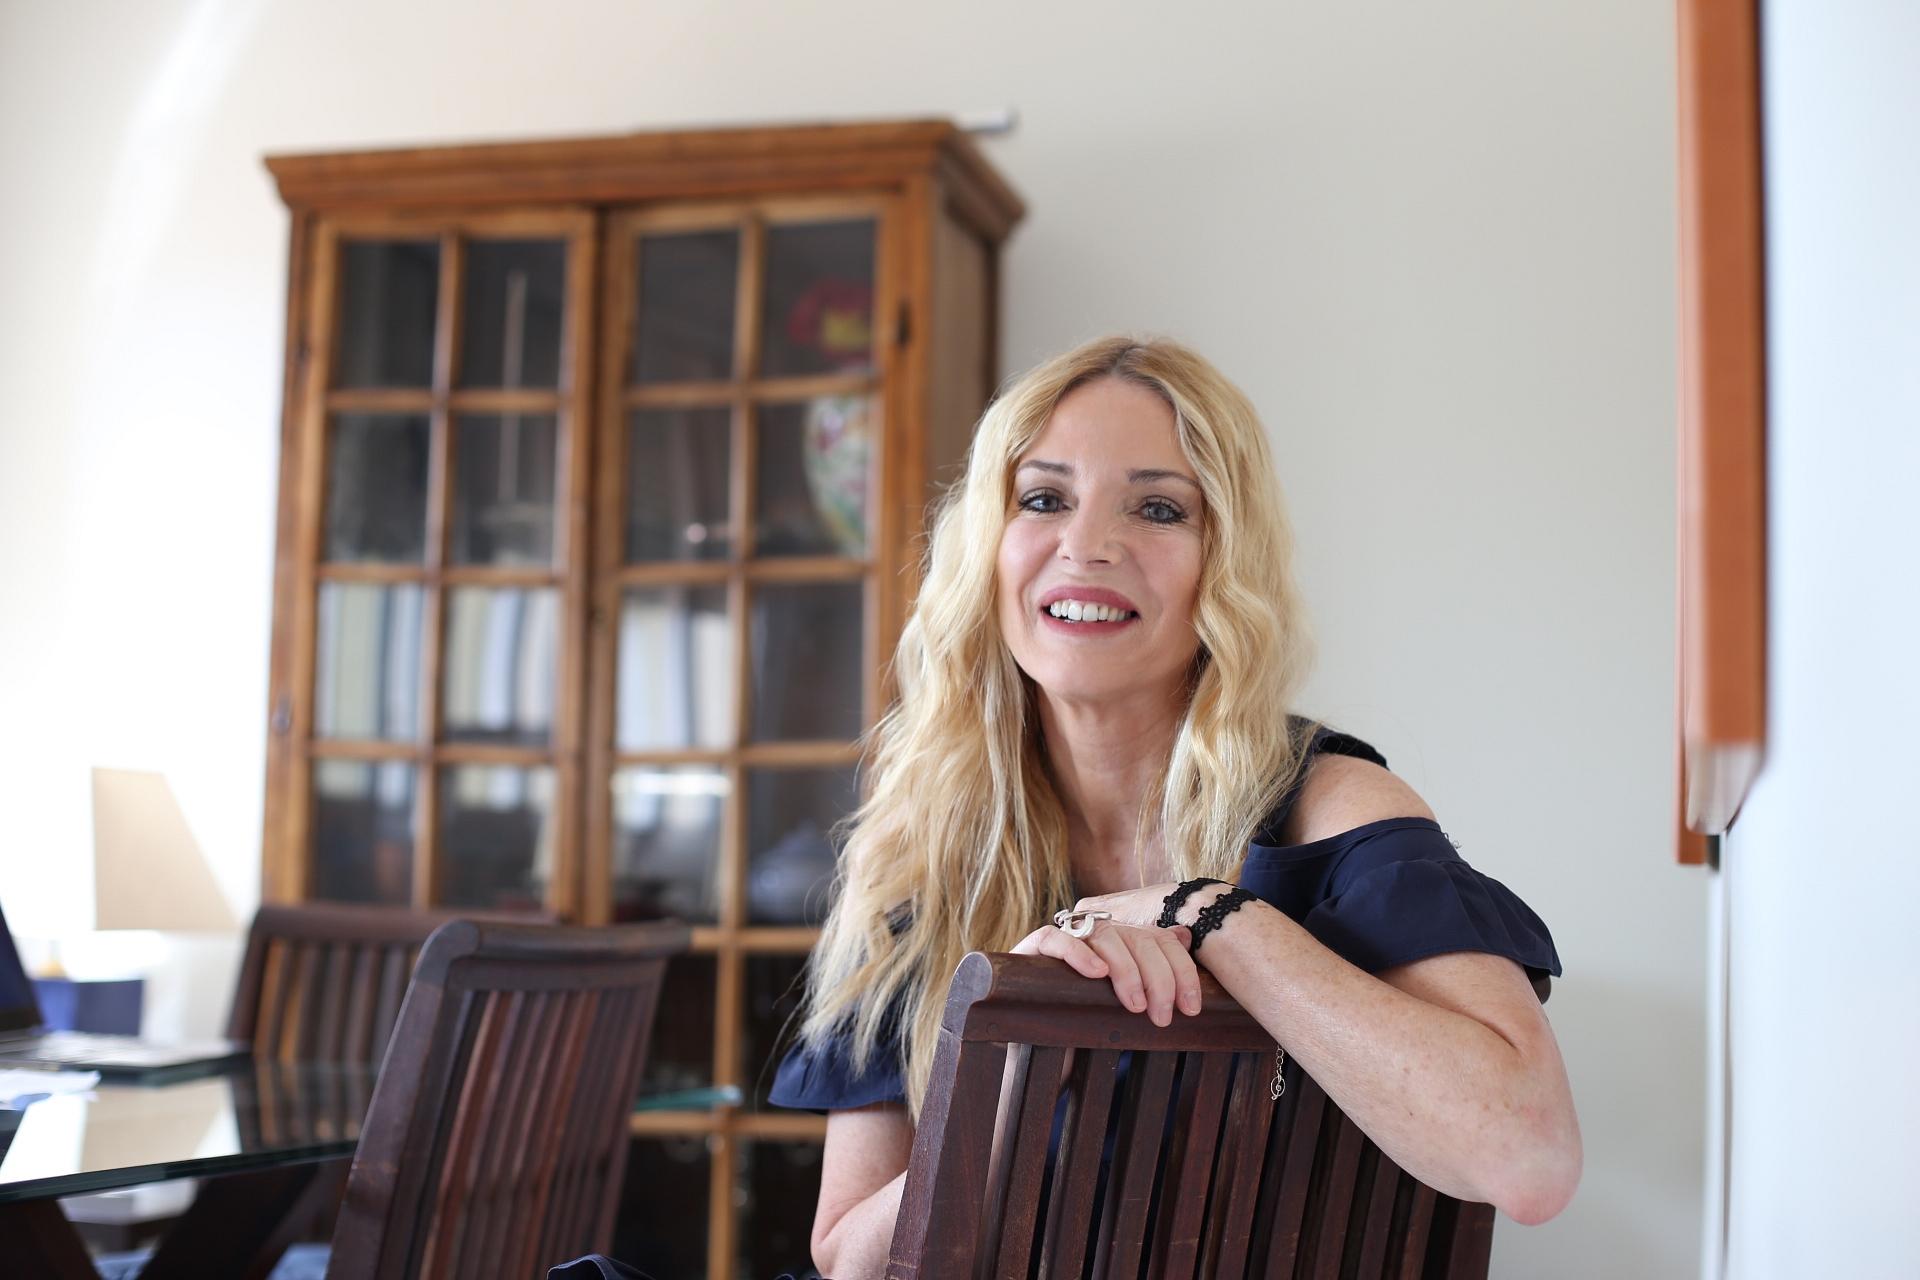 FOTO: Belén Vargas.